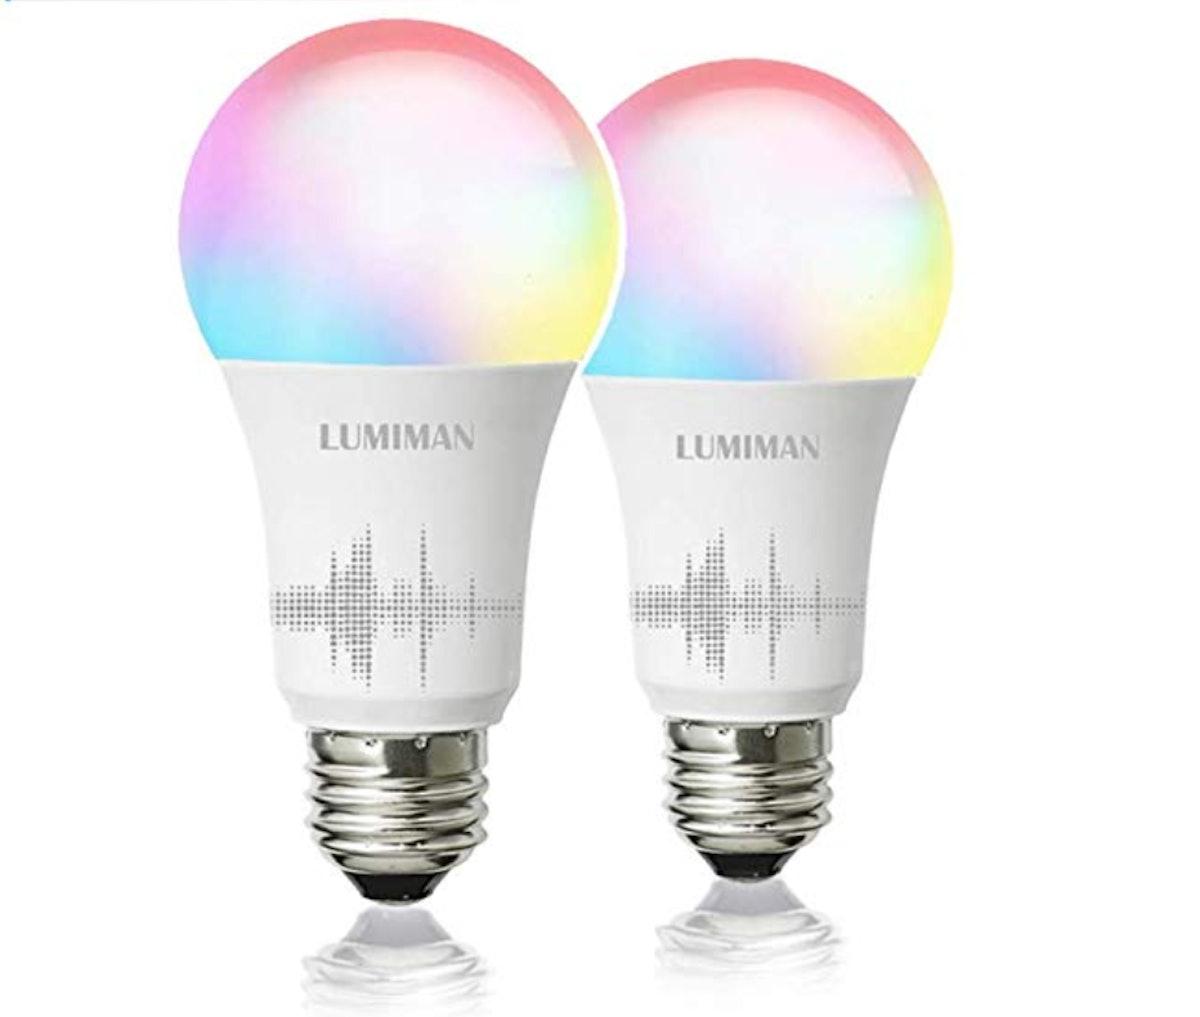 Smart WiFi Light Bulb A19 E26 Multicolor LUMIMAN 2 Pack